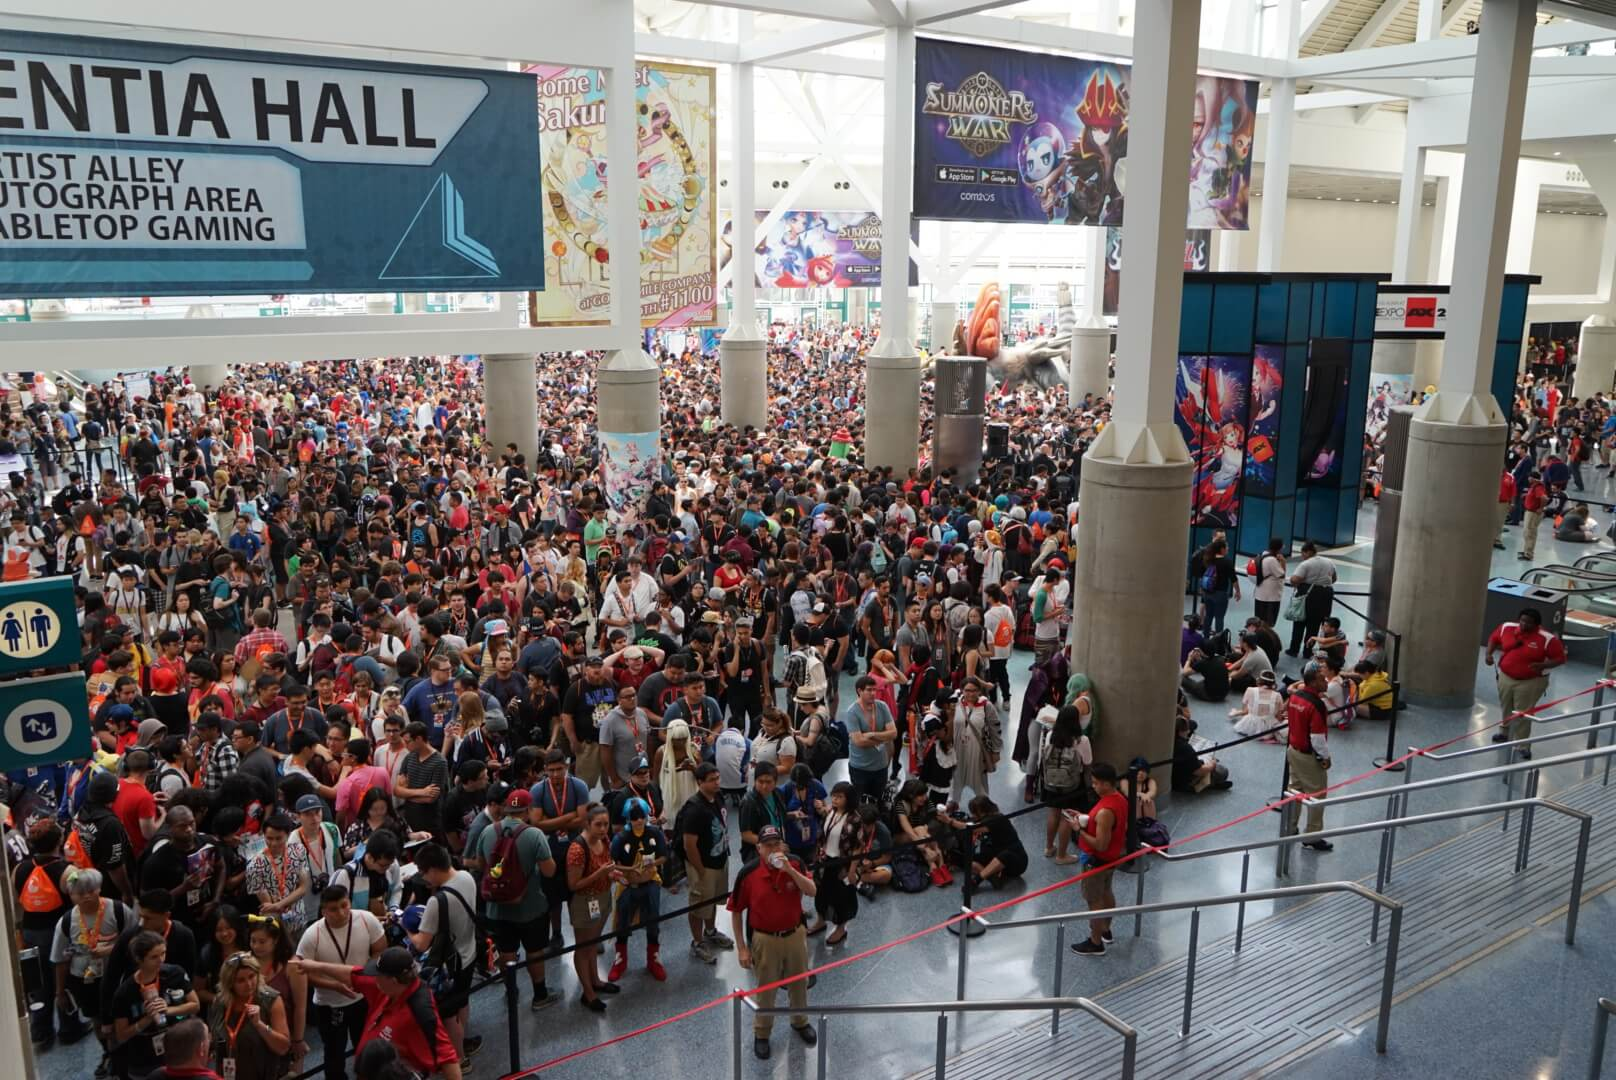 Anime expo crowd